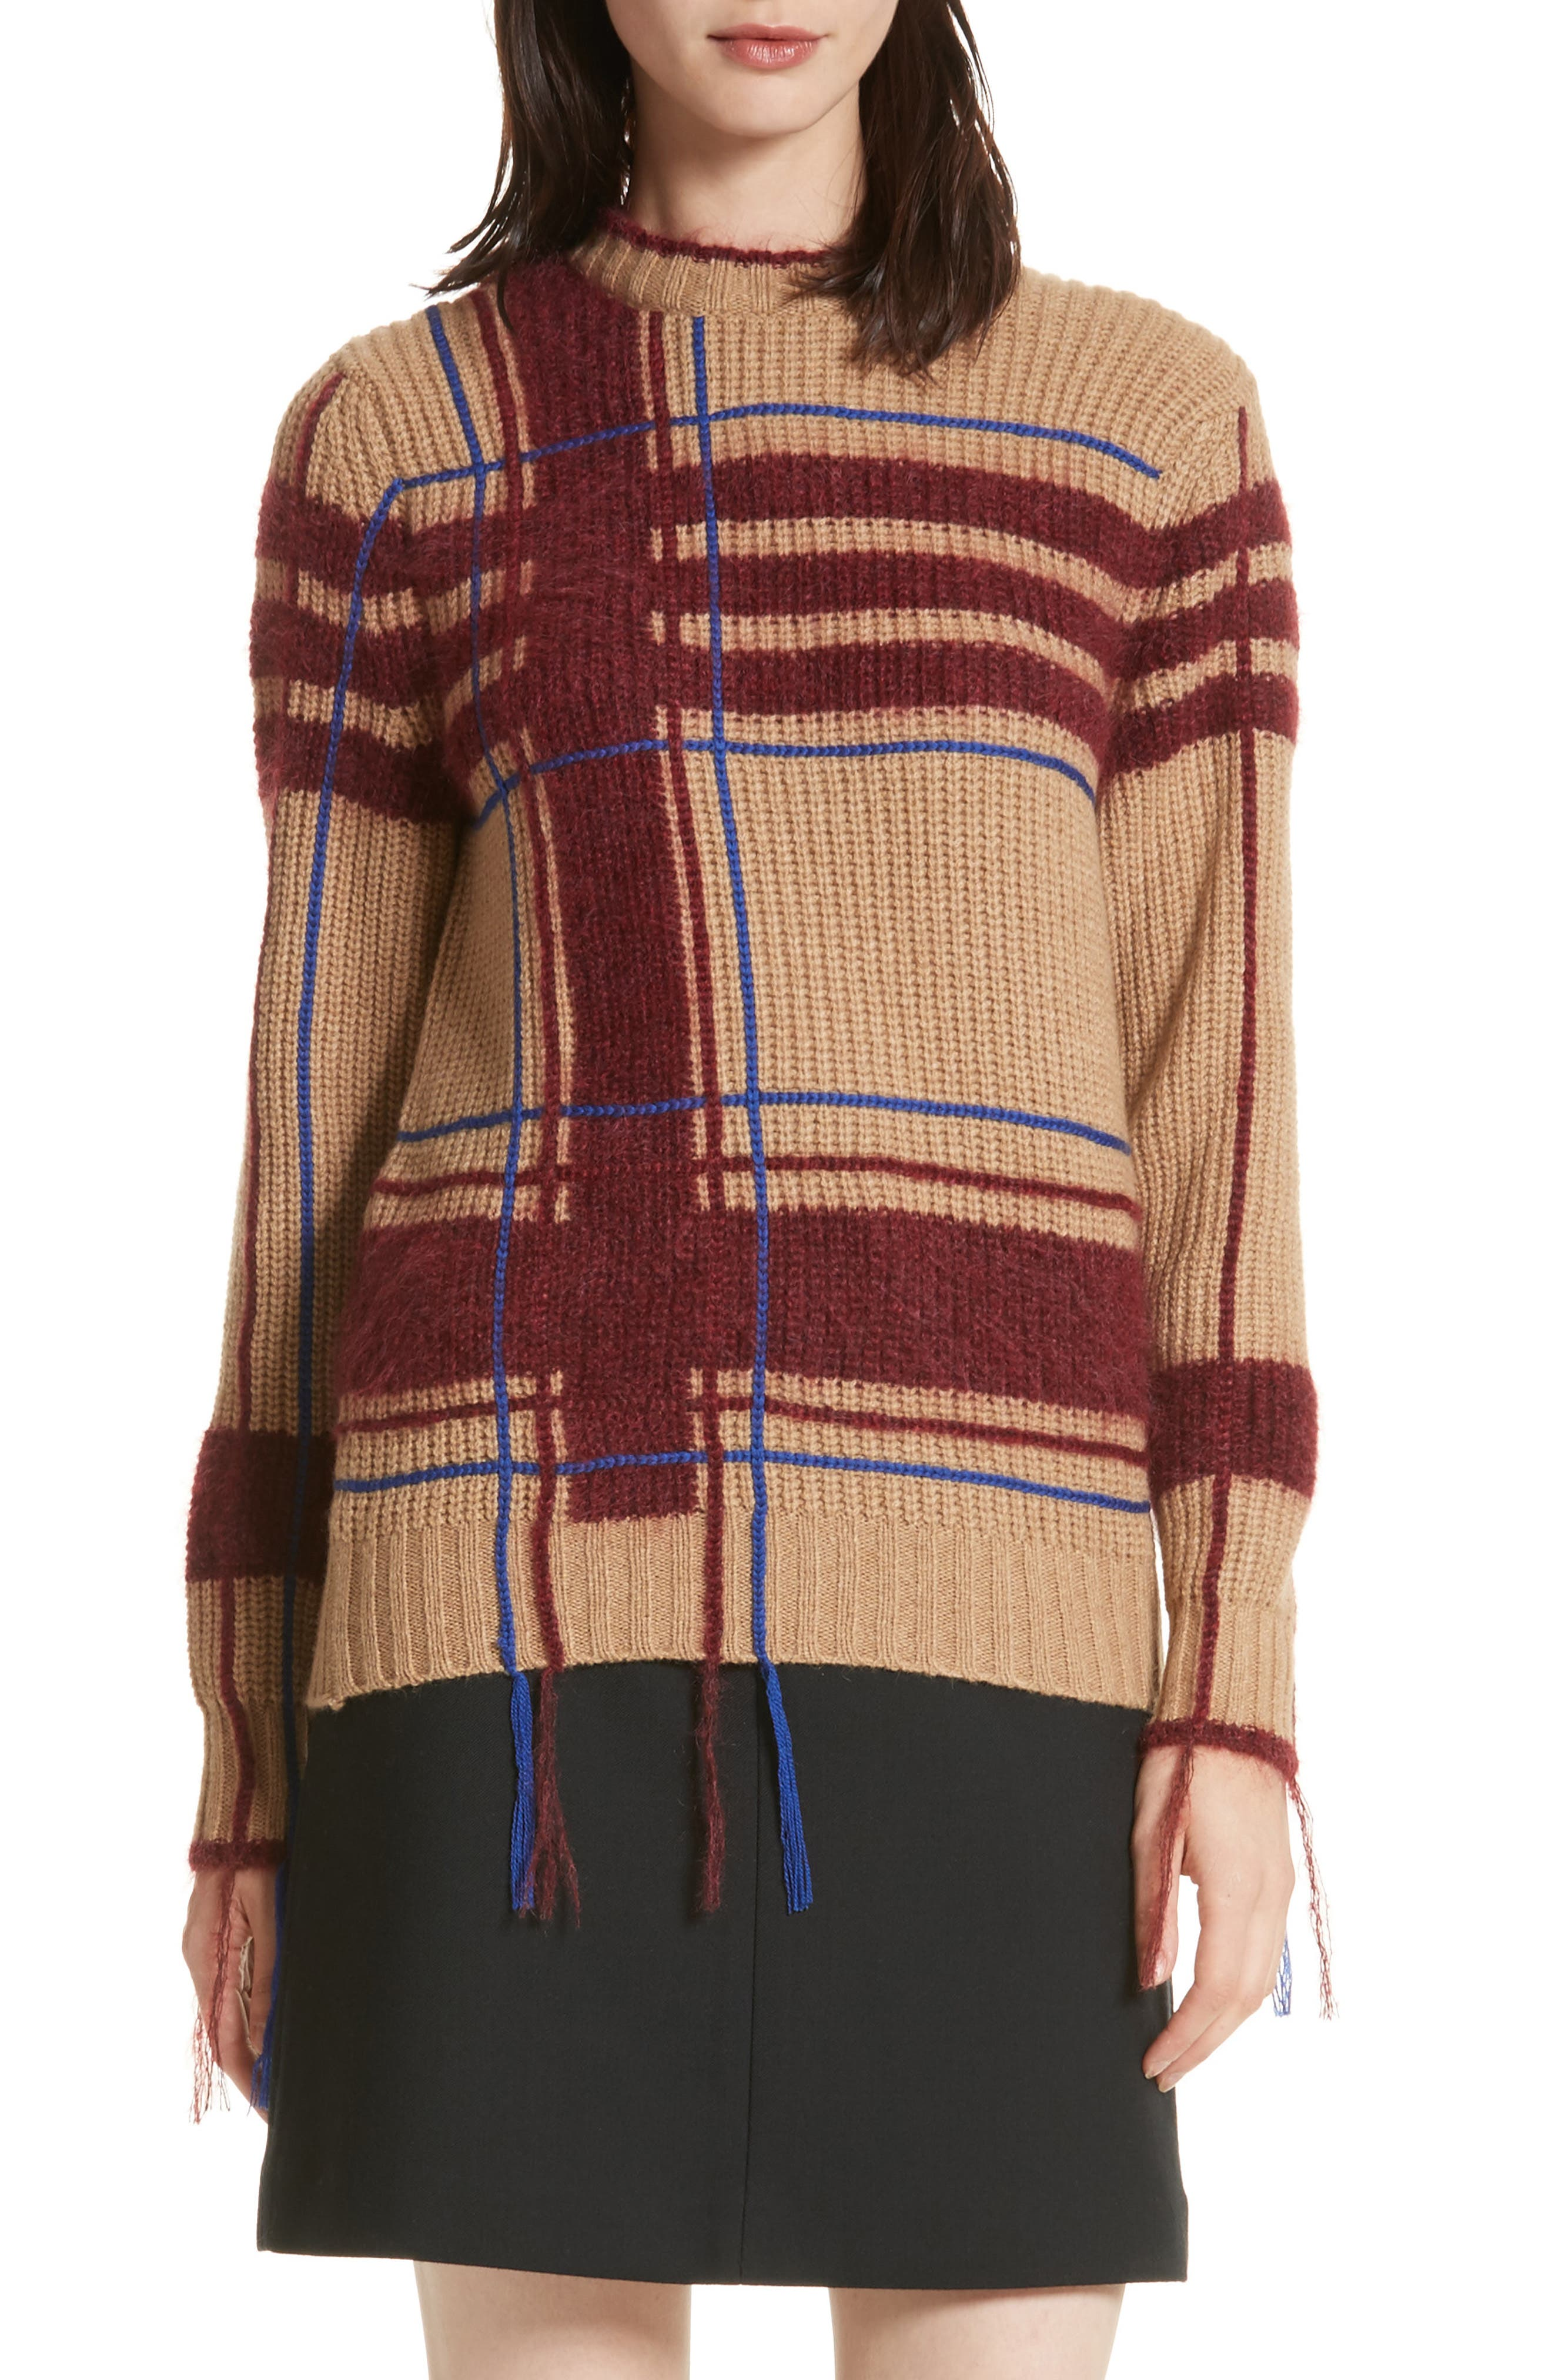 Tory Burch Eden Plaid Sweater